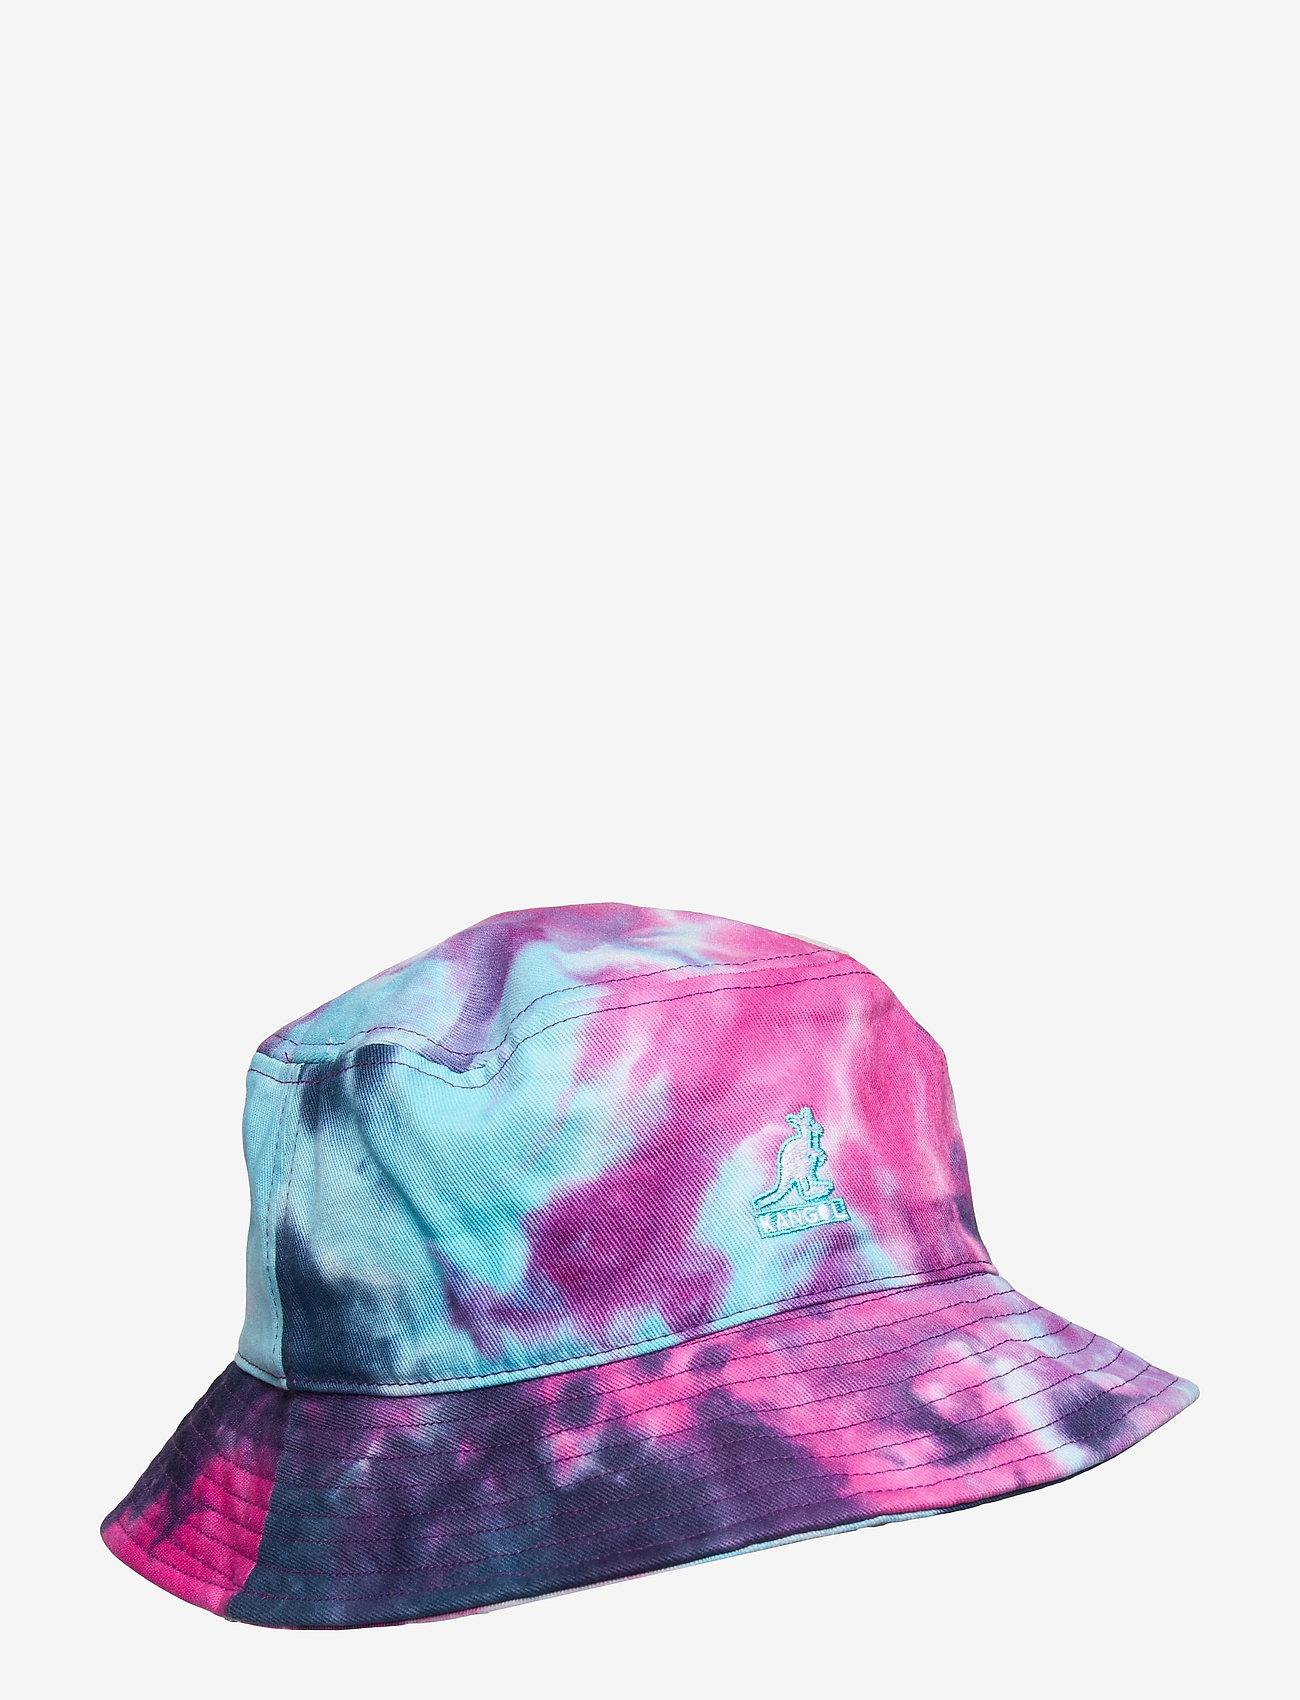 Kangol - TIE DYE BUCKET - bucket hats - rainbow - 0